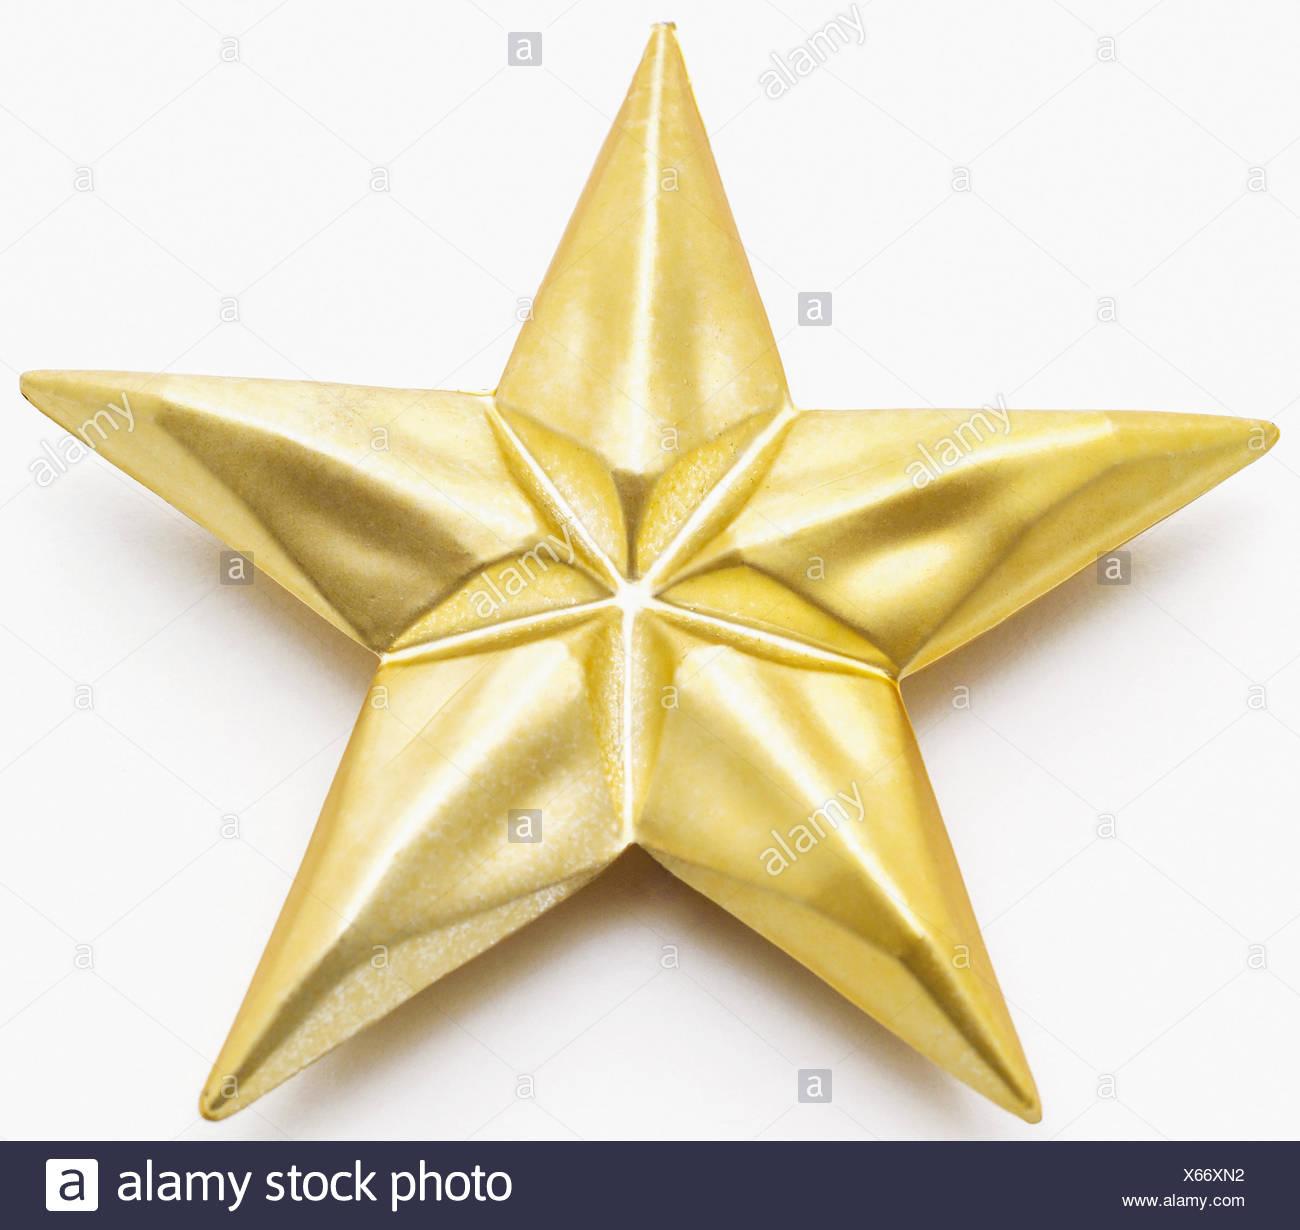 Goldener Stern Christbaumschmuck Stock Photo 279206510 Alamy